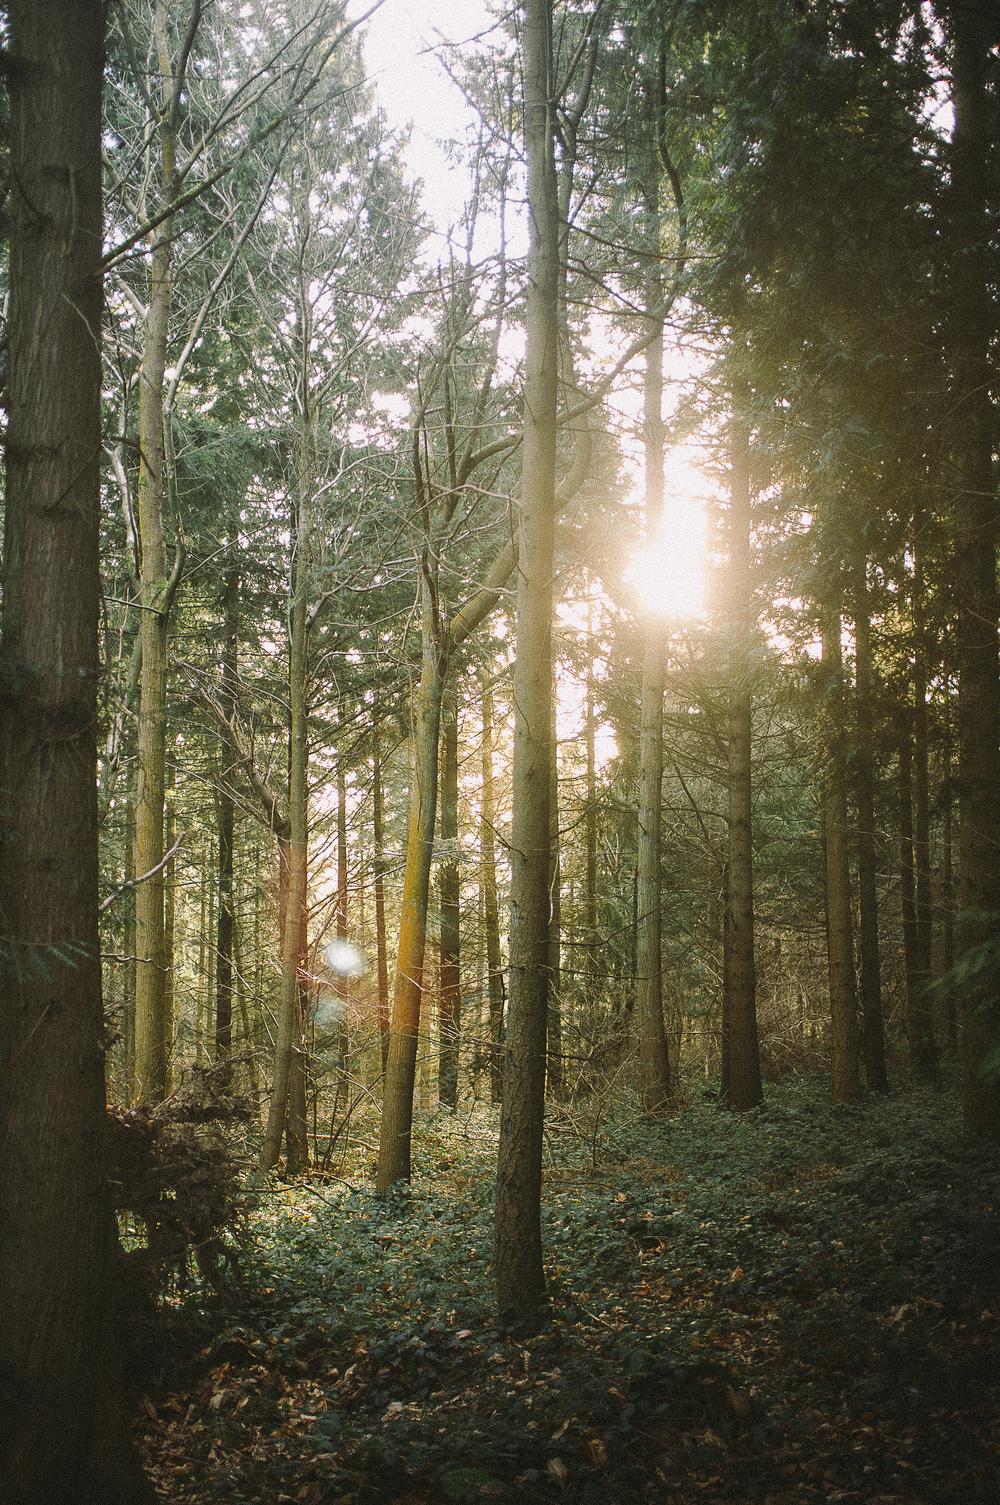 fuji x100 woods-1-7.jpg